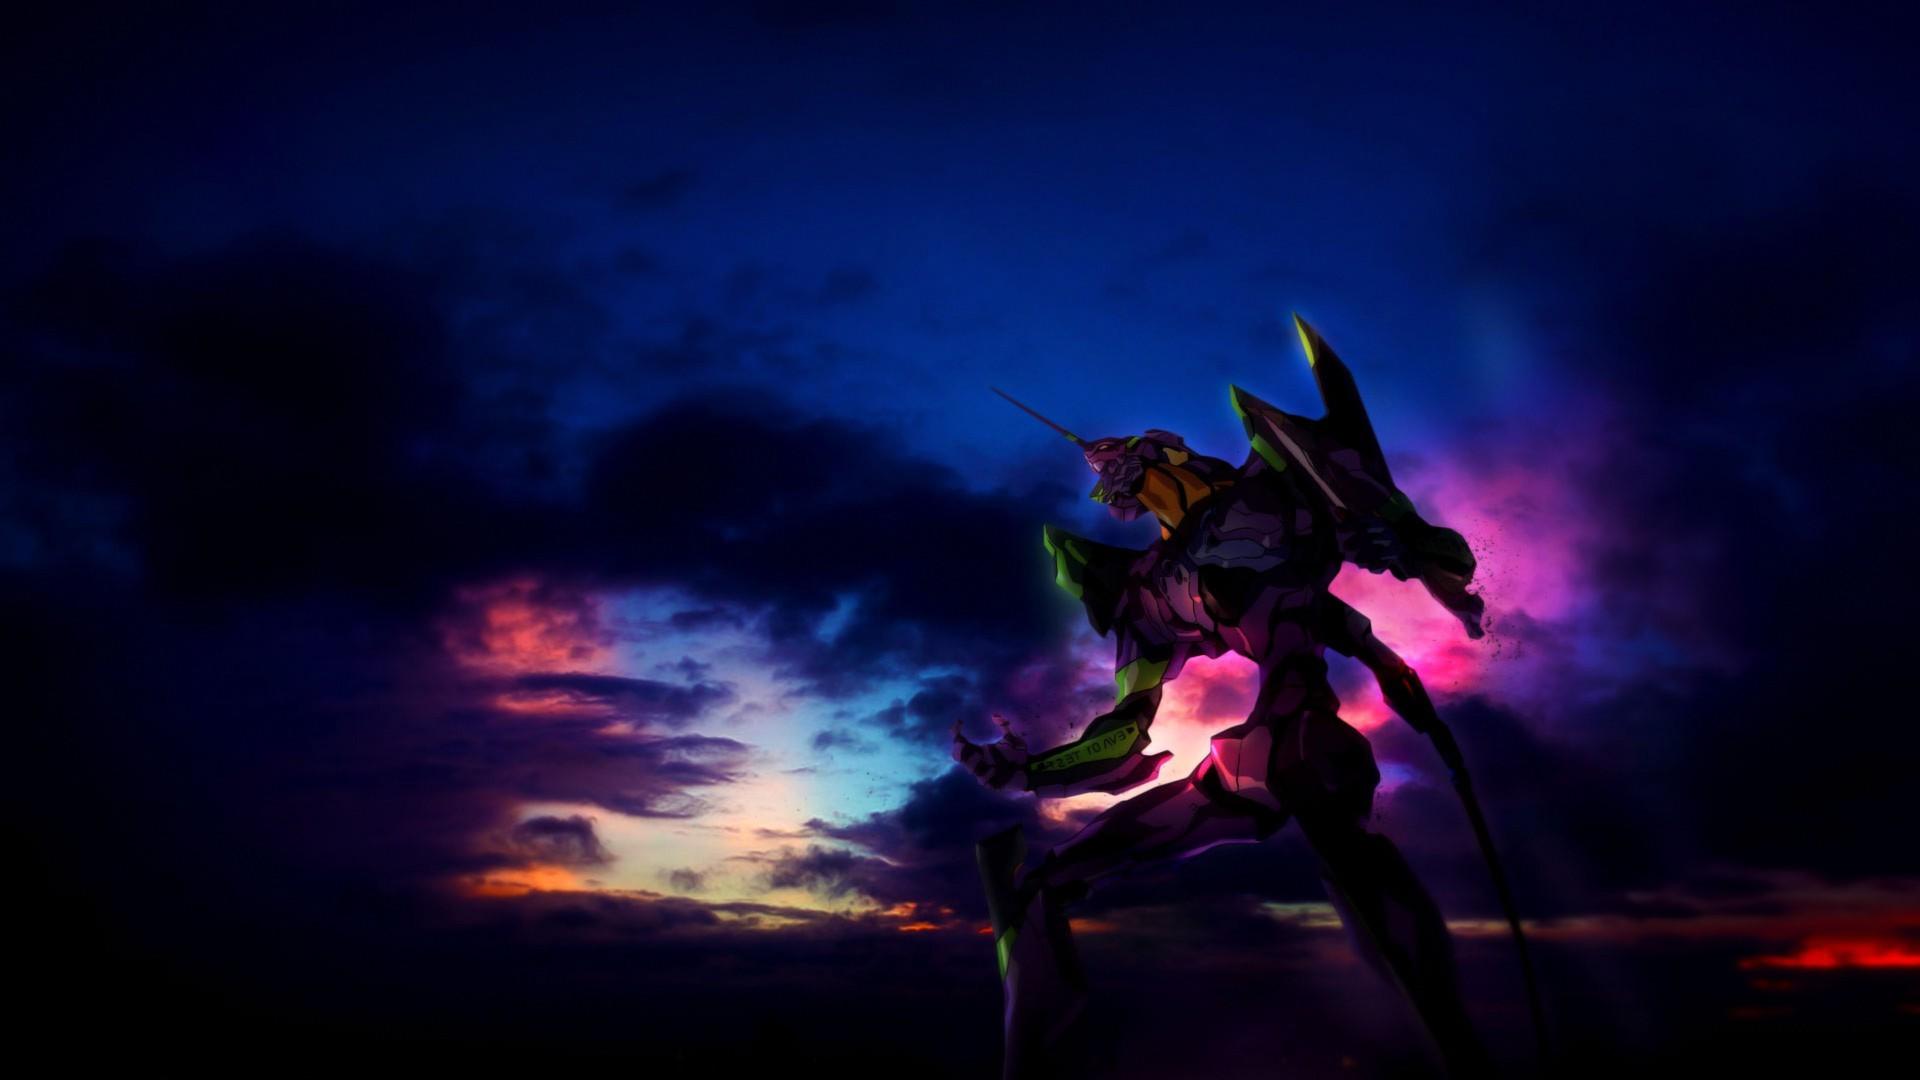 Wallpaper 1920x1080 Px Anime Clouds Eva Unit 01 Neon